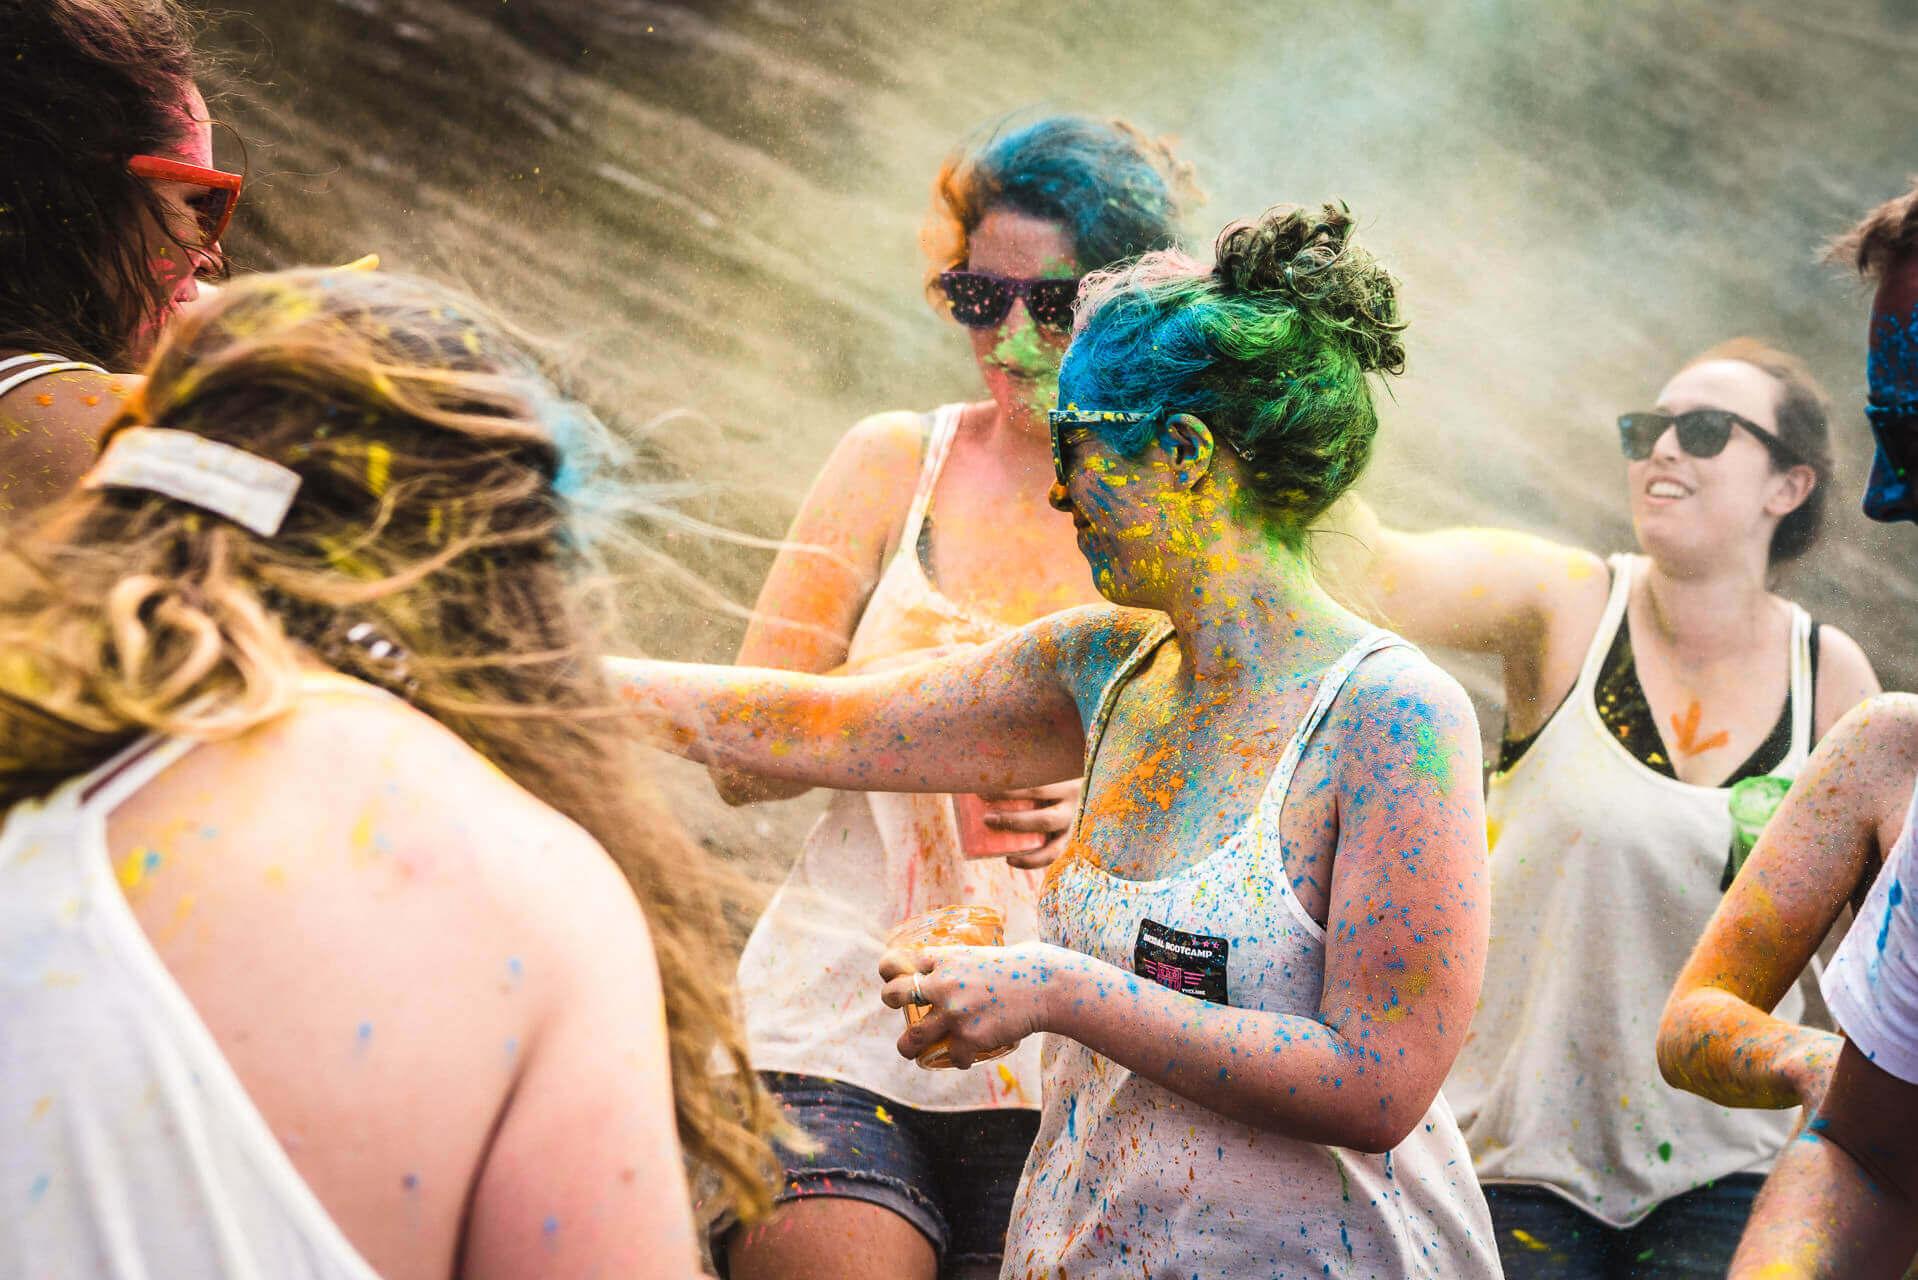 activite evjf poudre holi couleur herault photographe studio graou